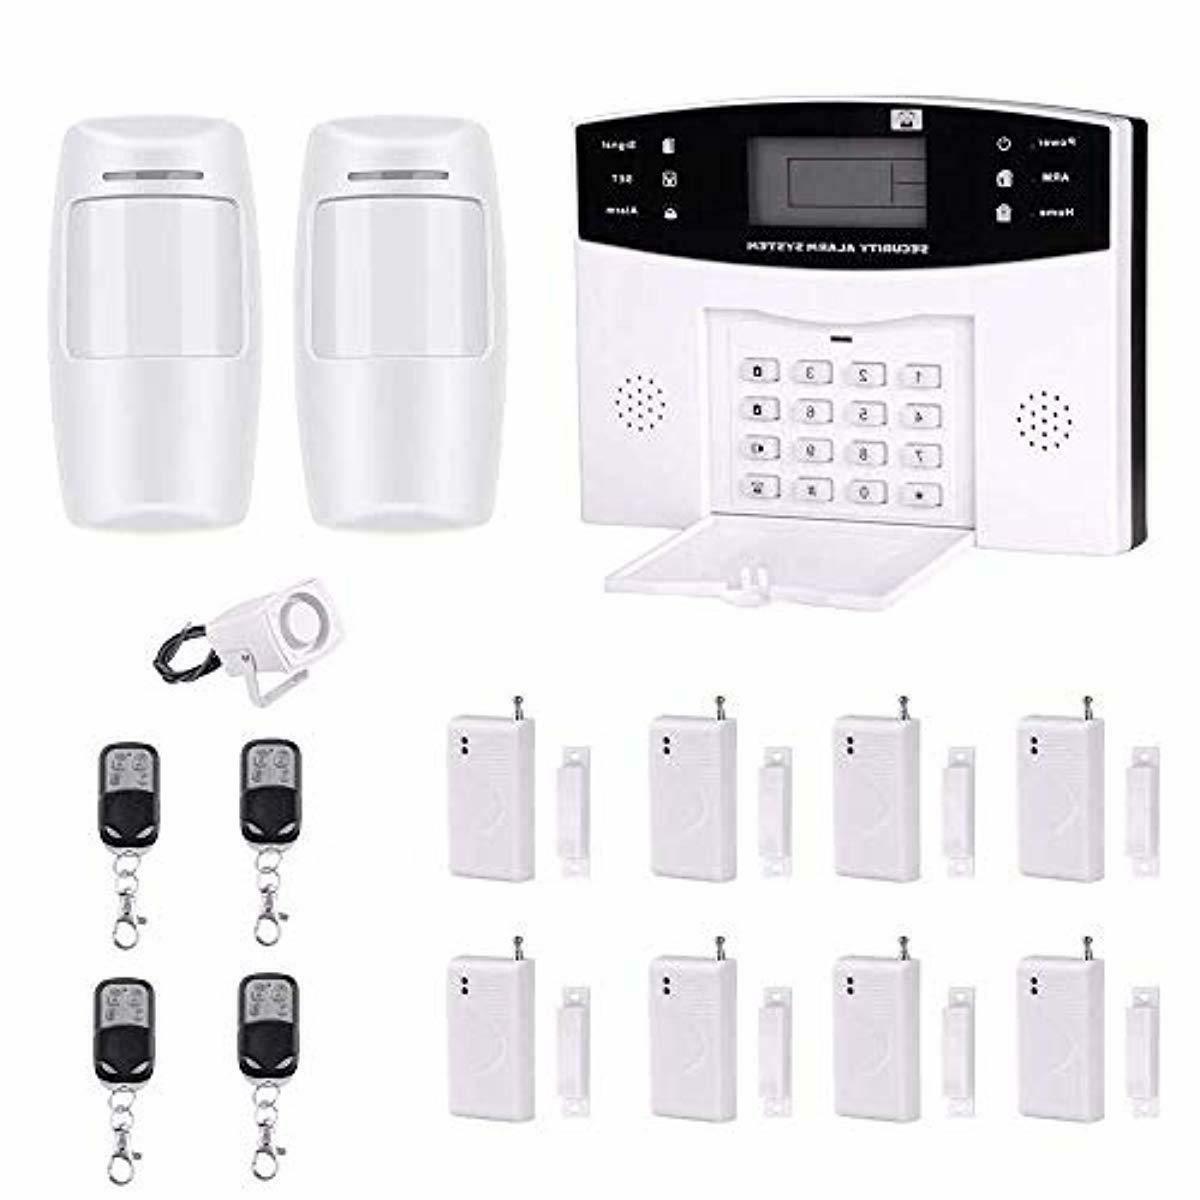 AG-security Home Security Fire Alarm